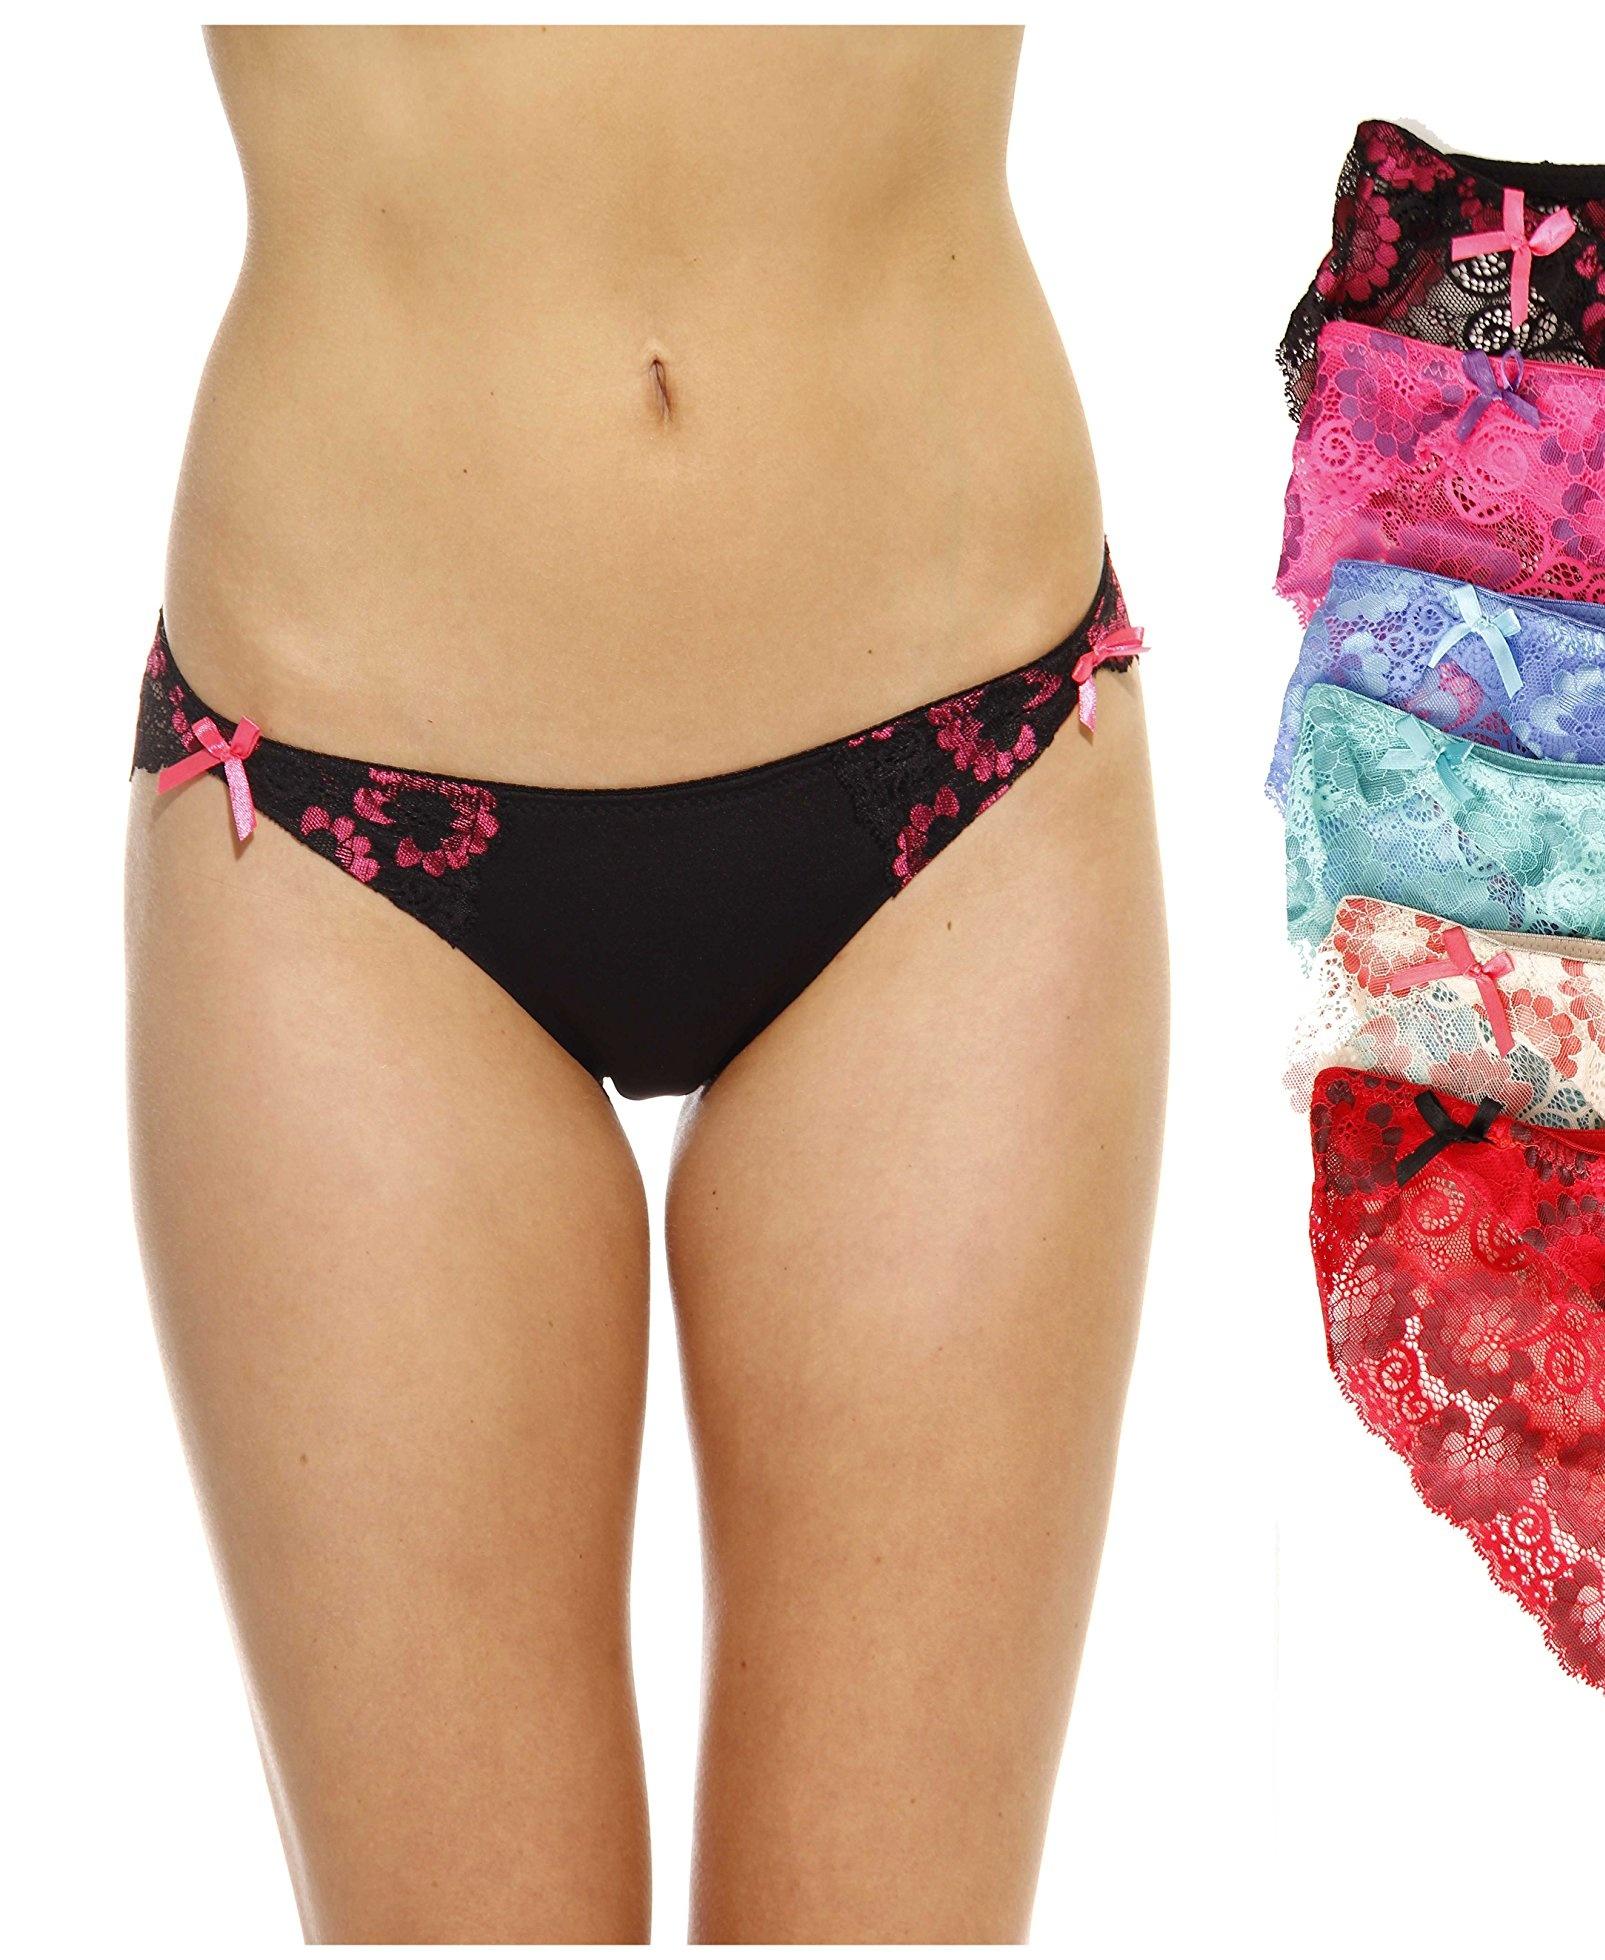 Just Intimates Thongs Panties for Women Pack of 6